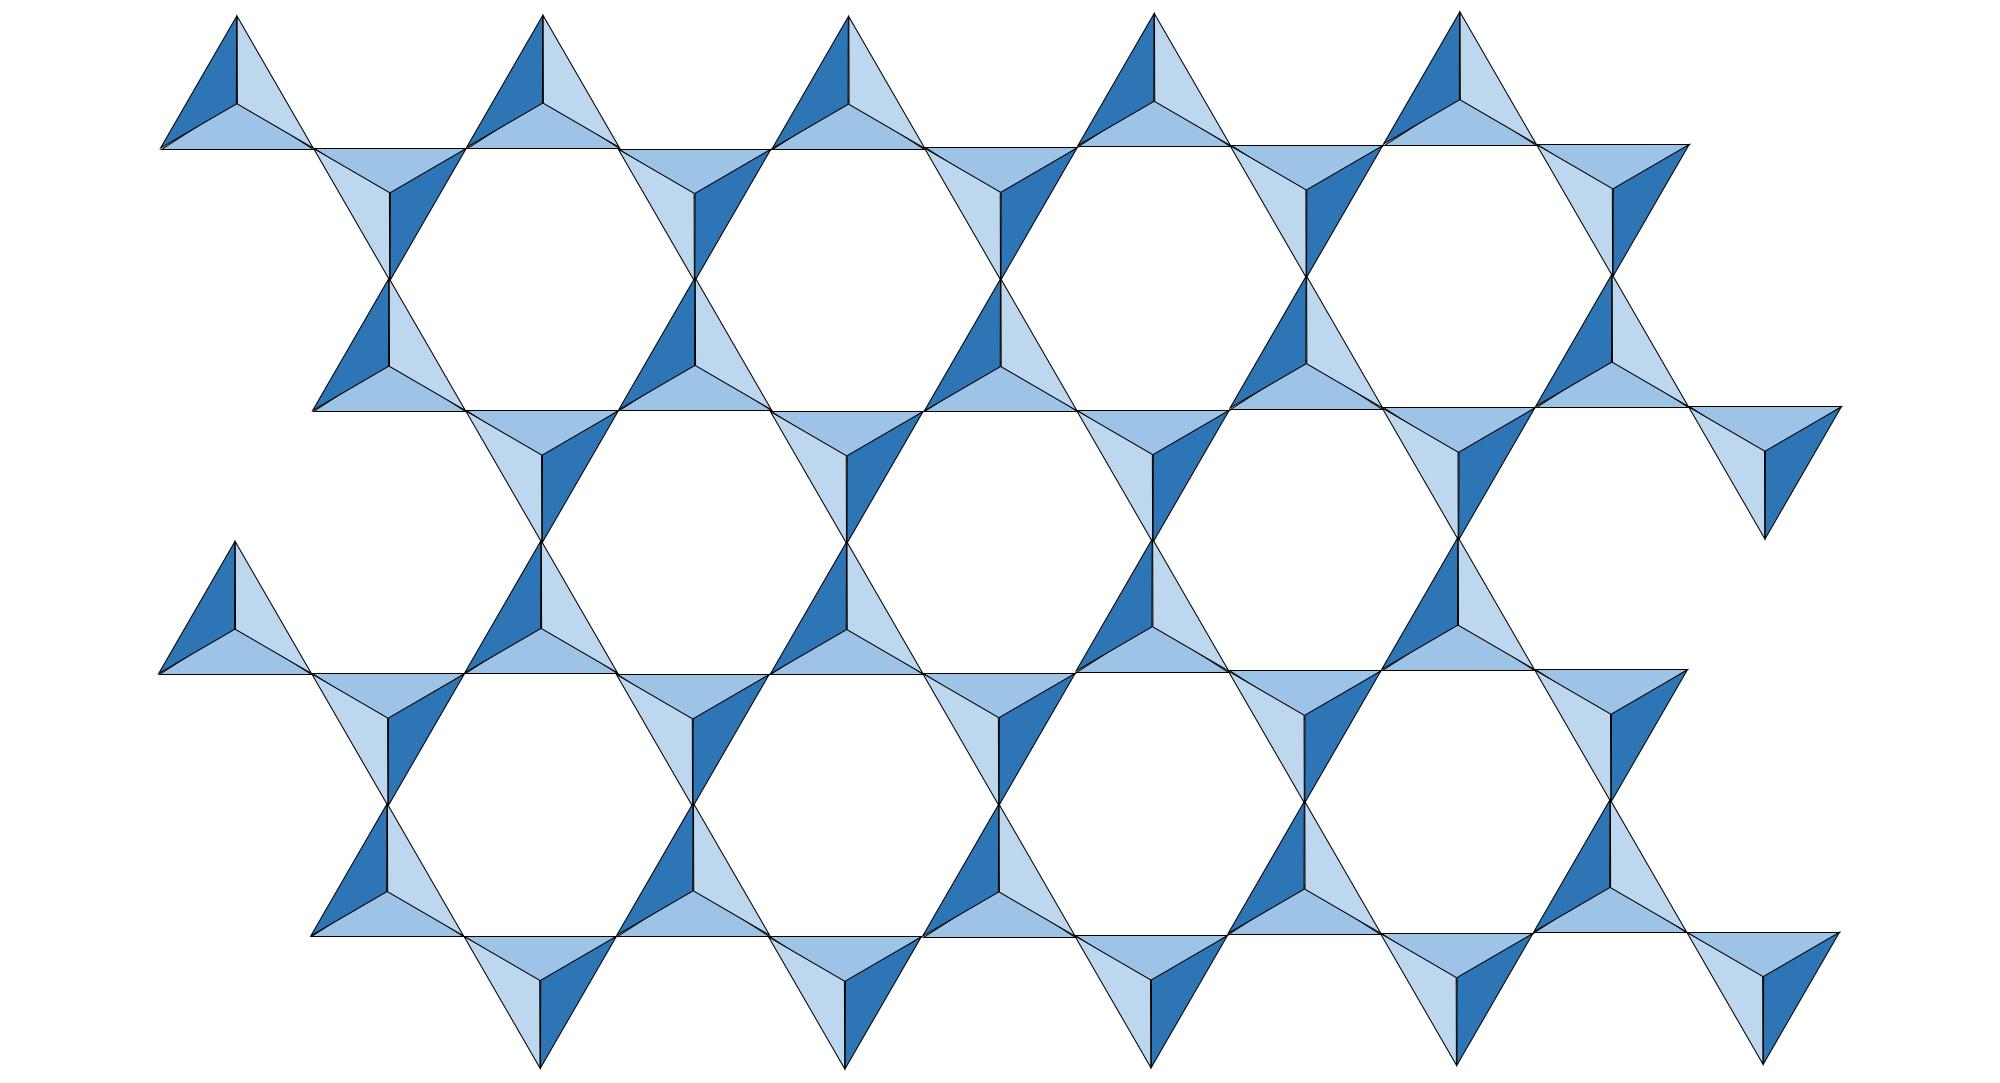 Illustration of a sheet of silicate tetrahedra.